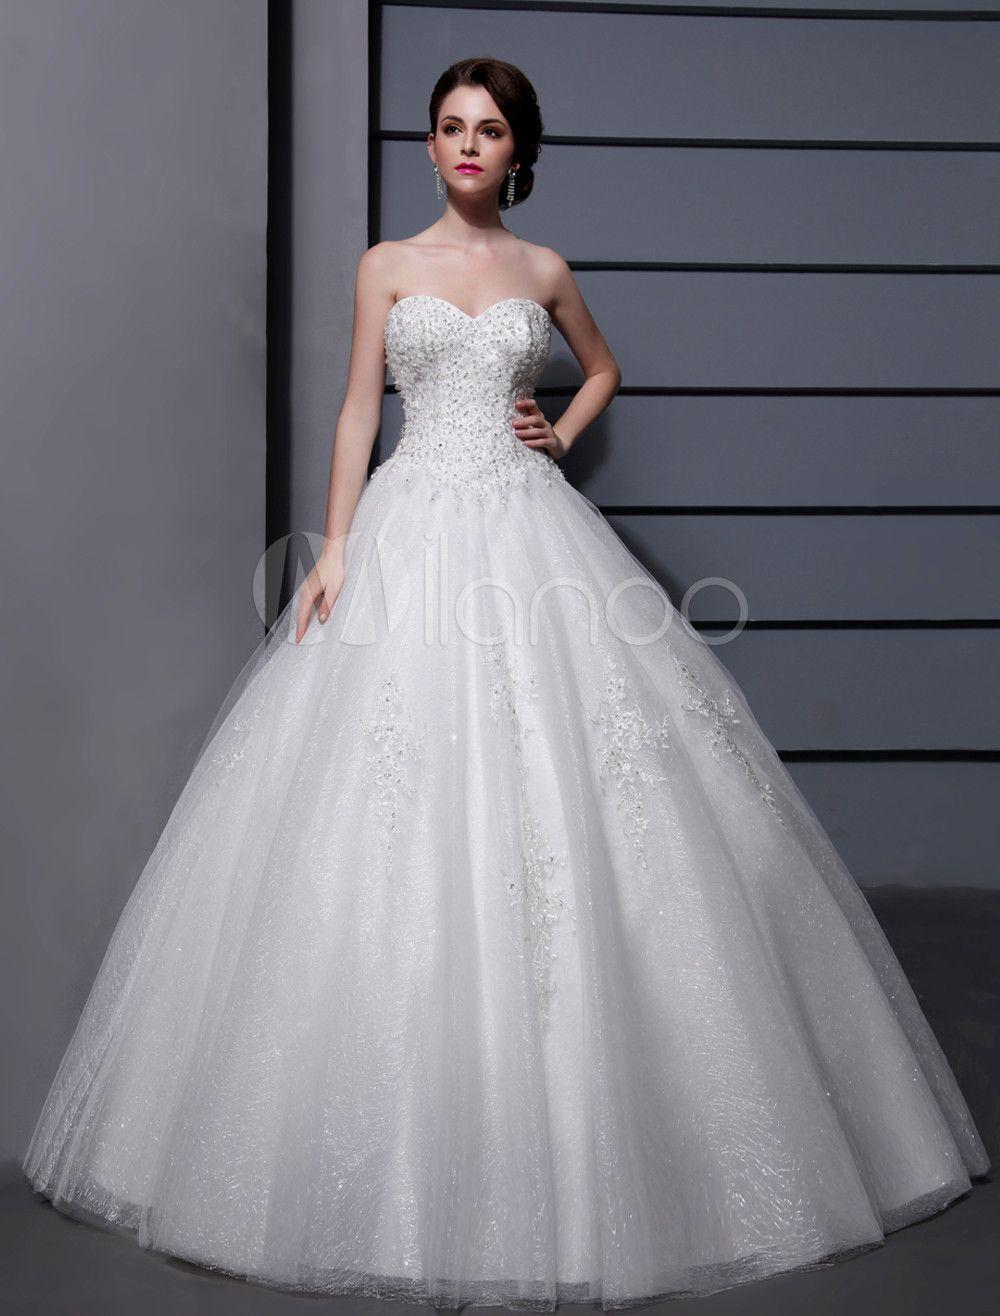 Wedding Dresses Ball Gown Strapless Bridal Dress Ivory